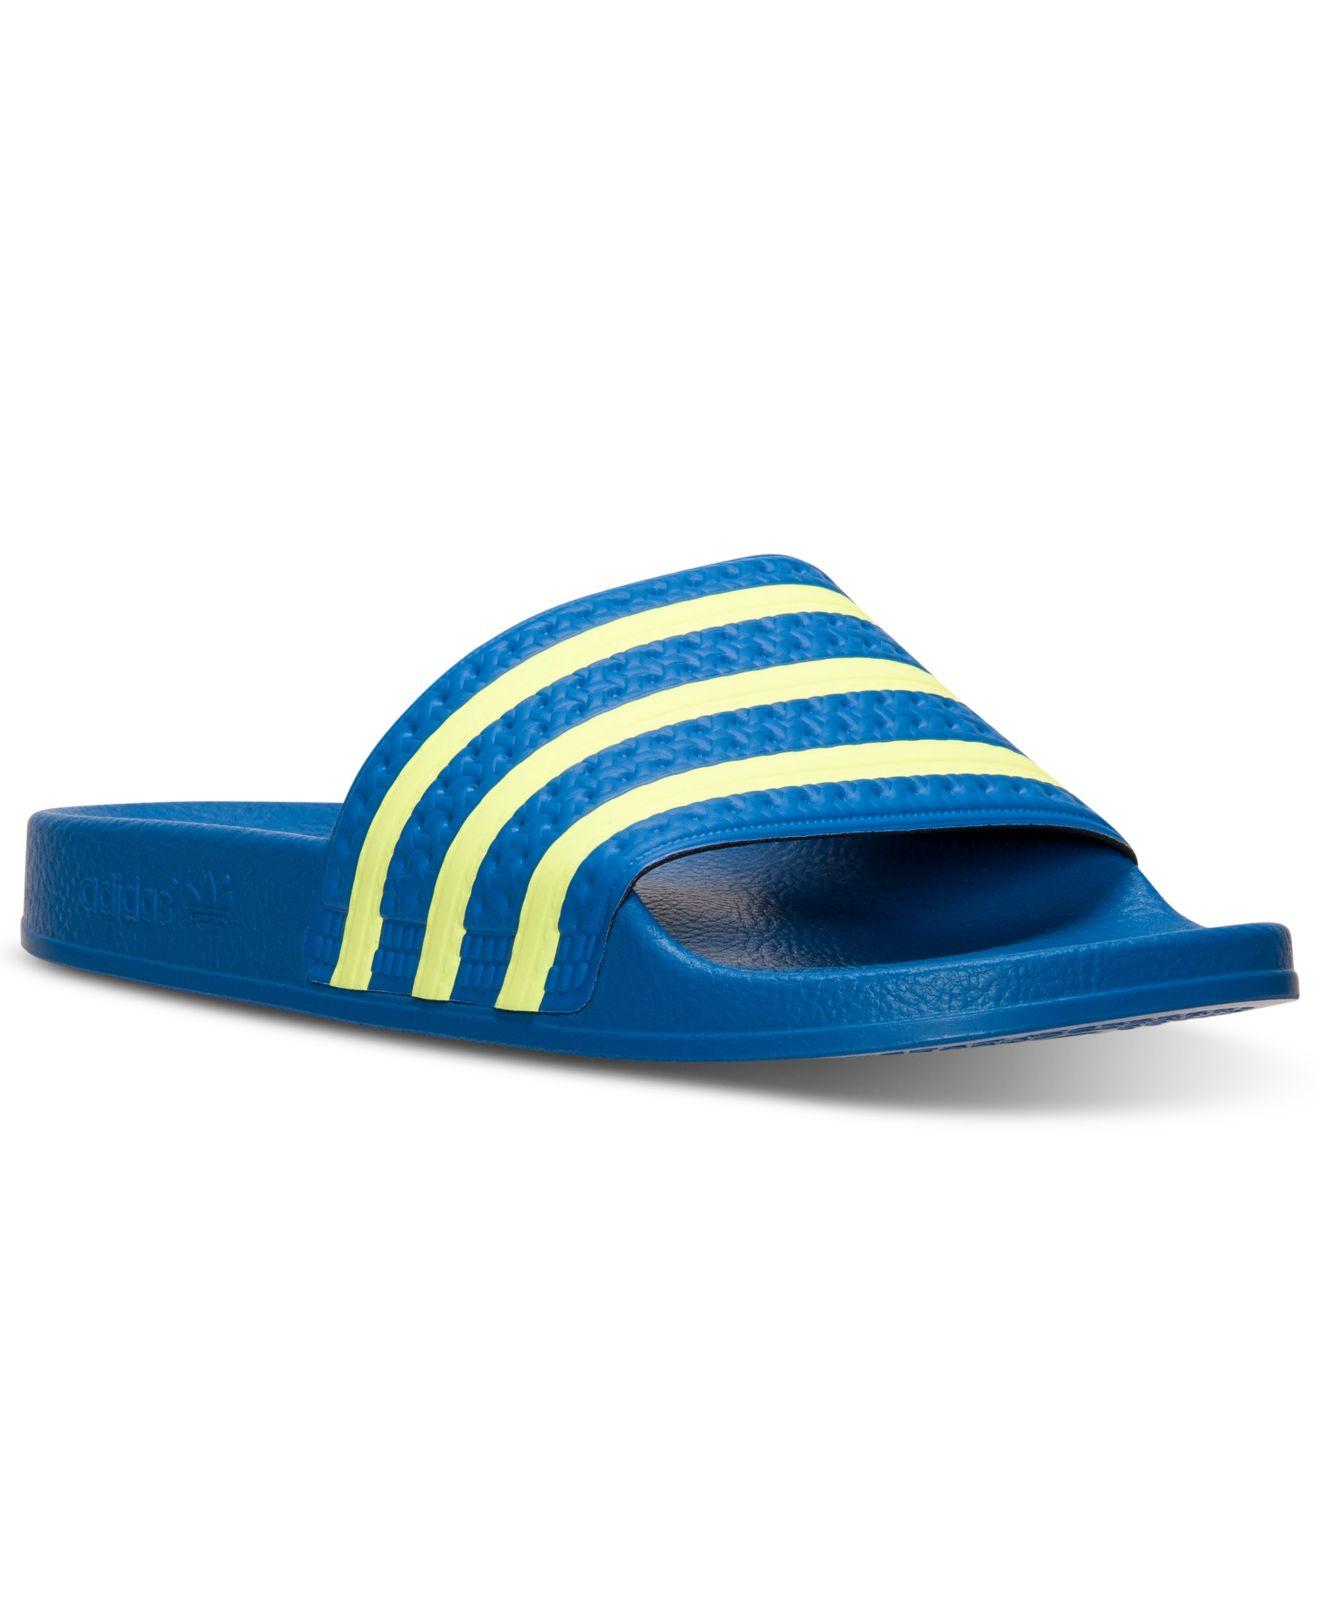 81b22e43b adidas Originals Men's Adilette Slide Sandals From Finish Line in ...